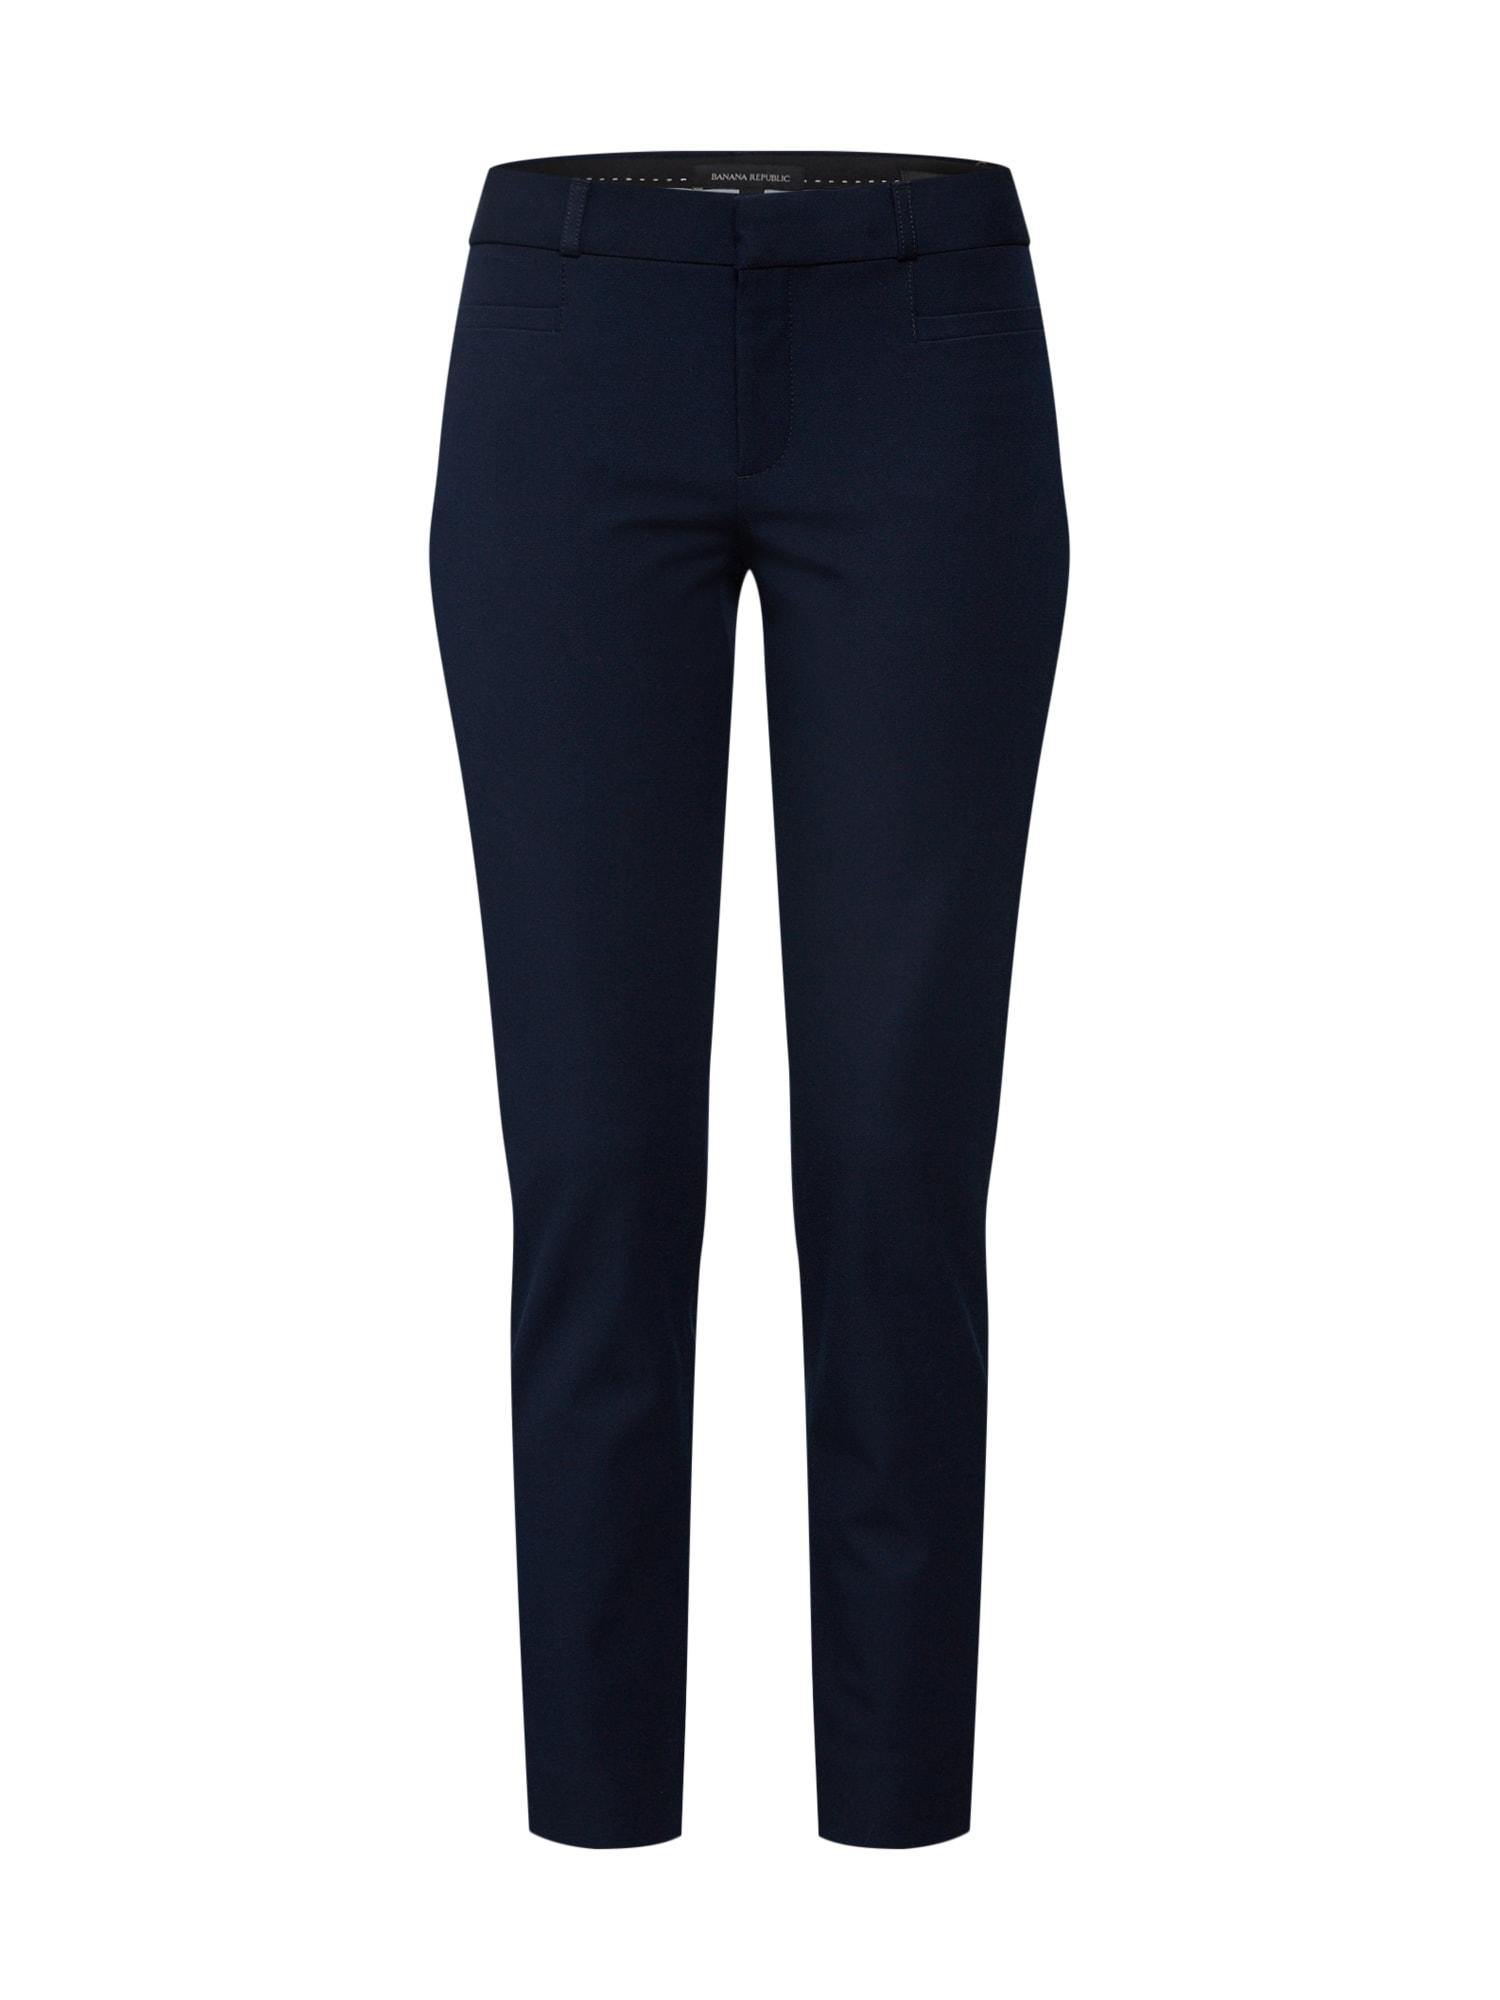 Banana Republic Chino stiliaus kelnės 'Sloan Solids' tamsiai mėlyna